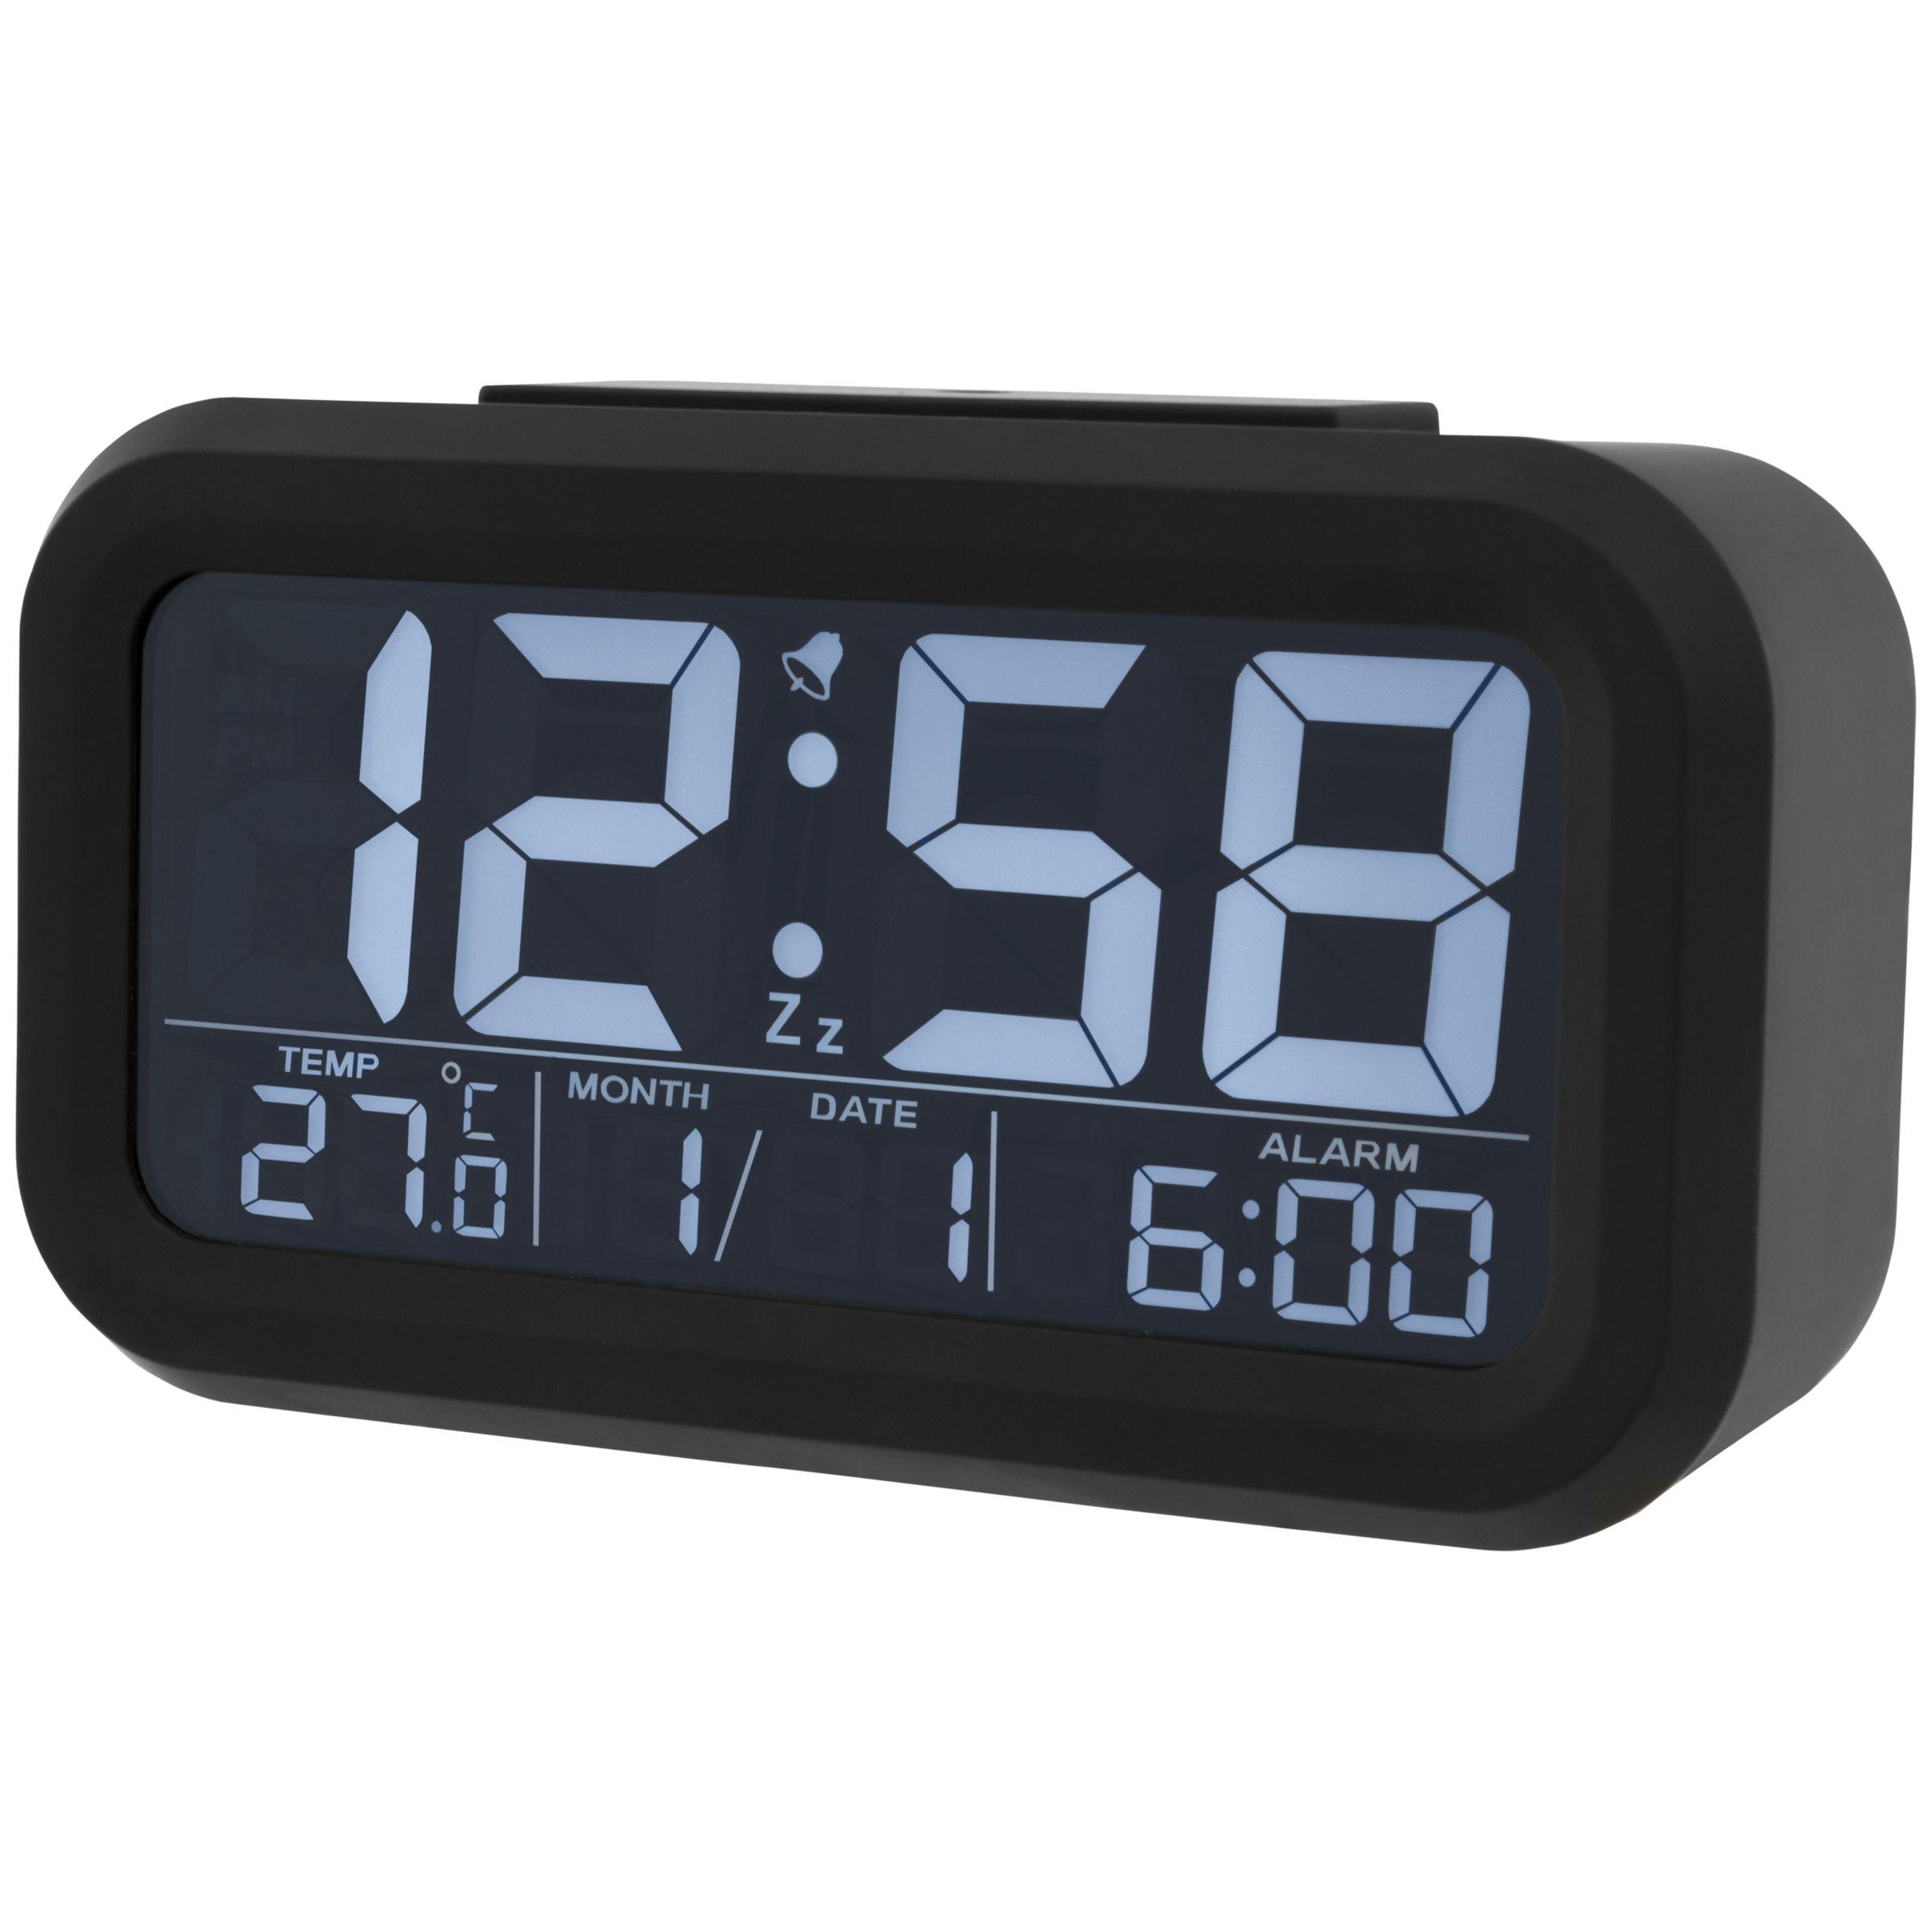 Acctim Acctim Meto Multifunction LCD Alarm Clock, Black